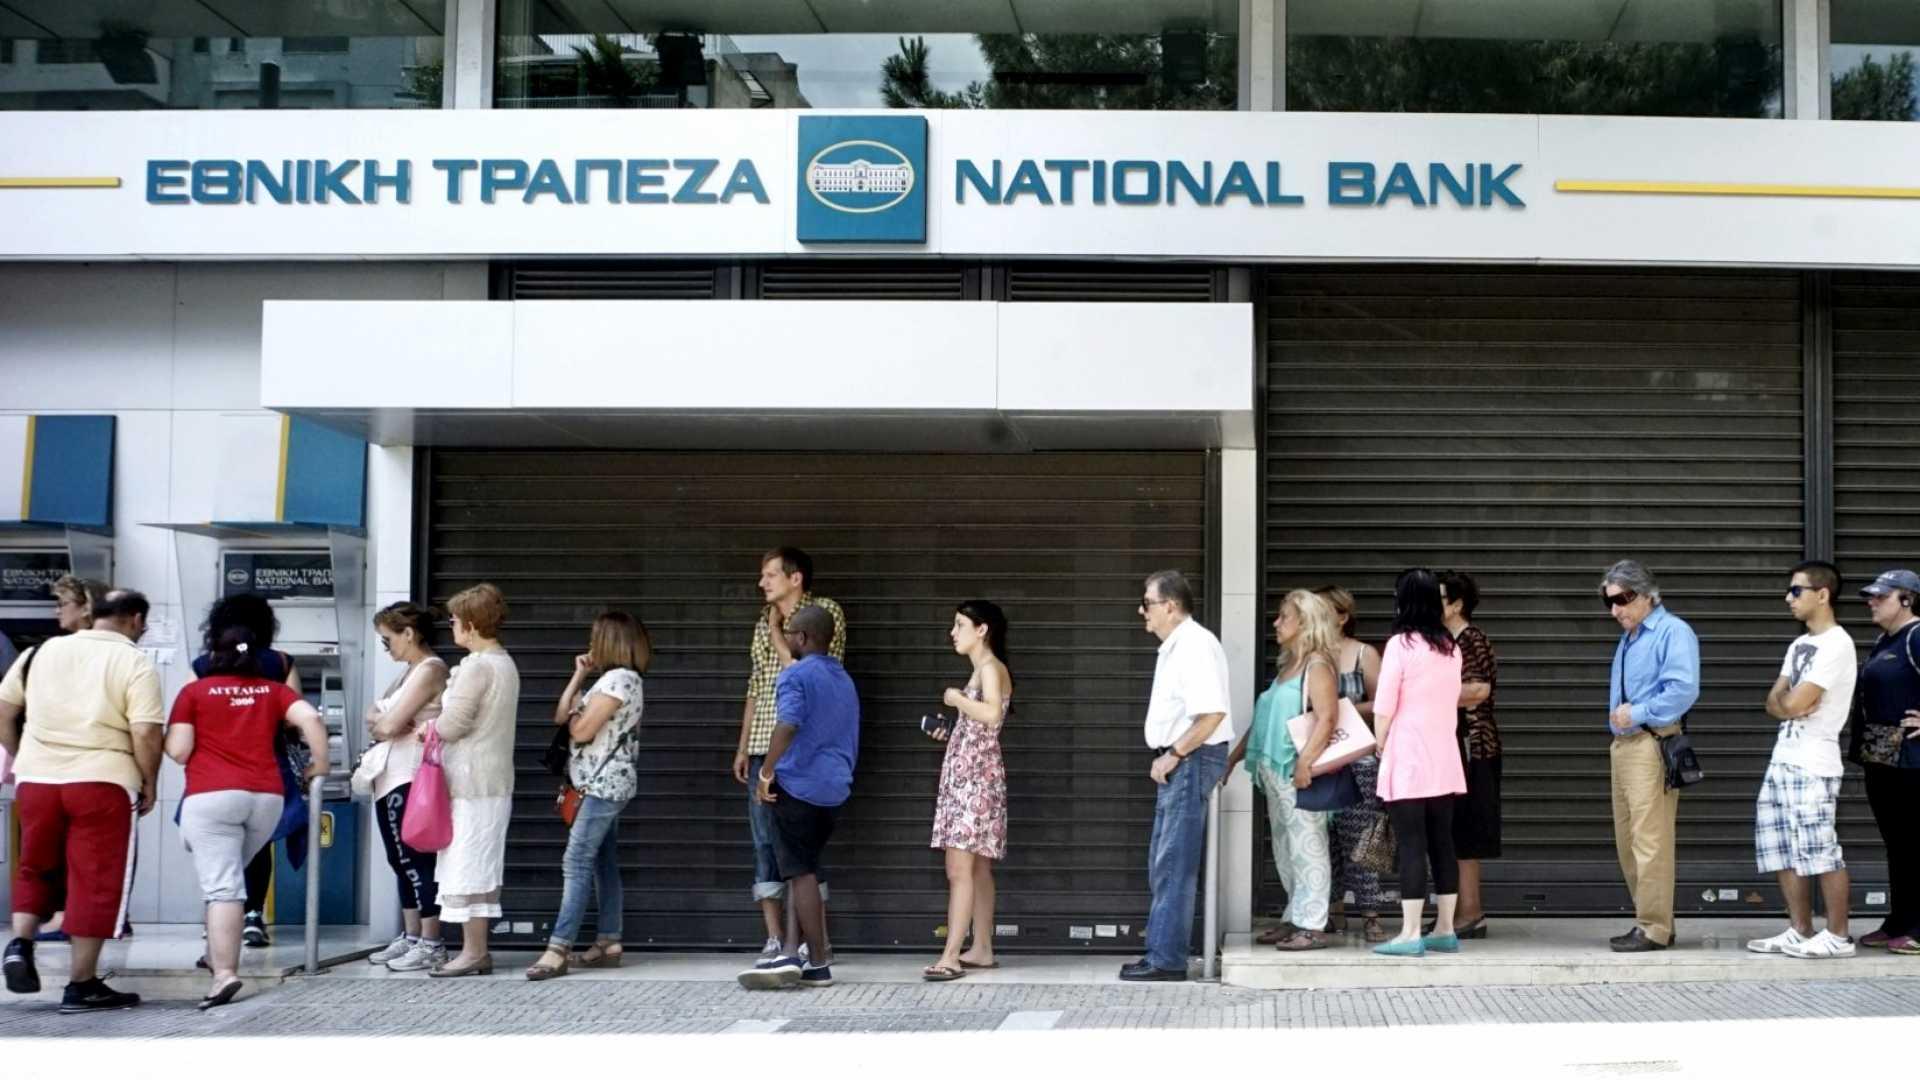 Greece preferred the mystery gift behind Door No. 3